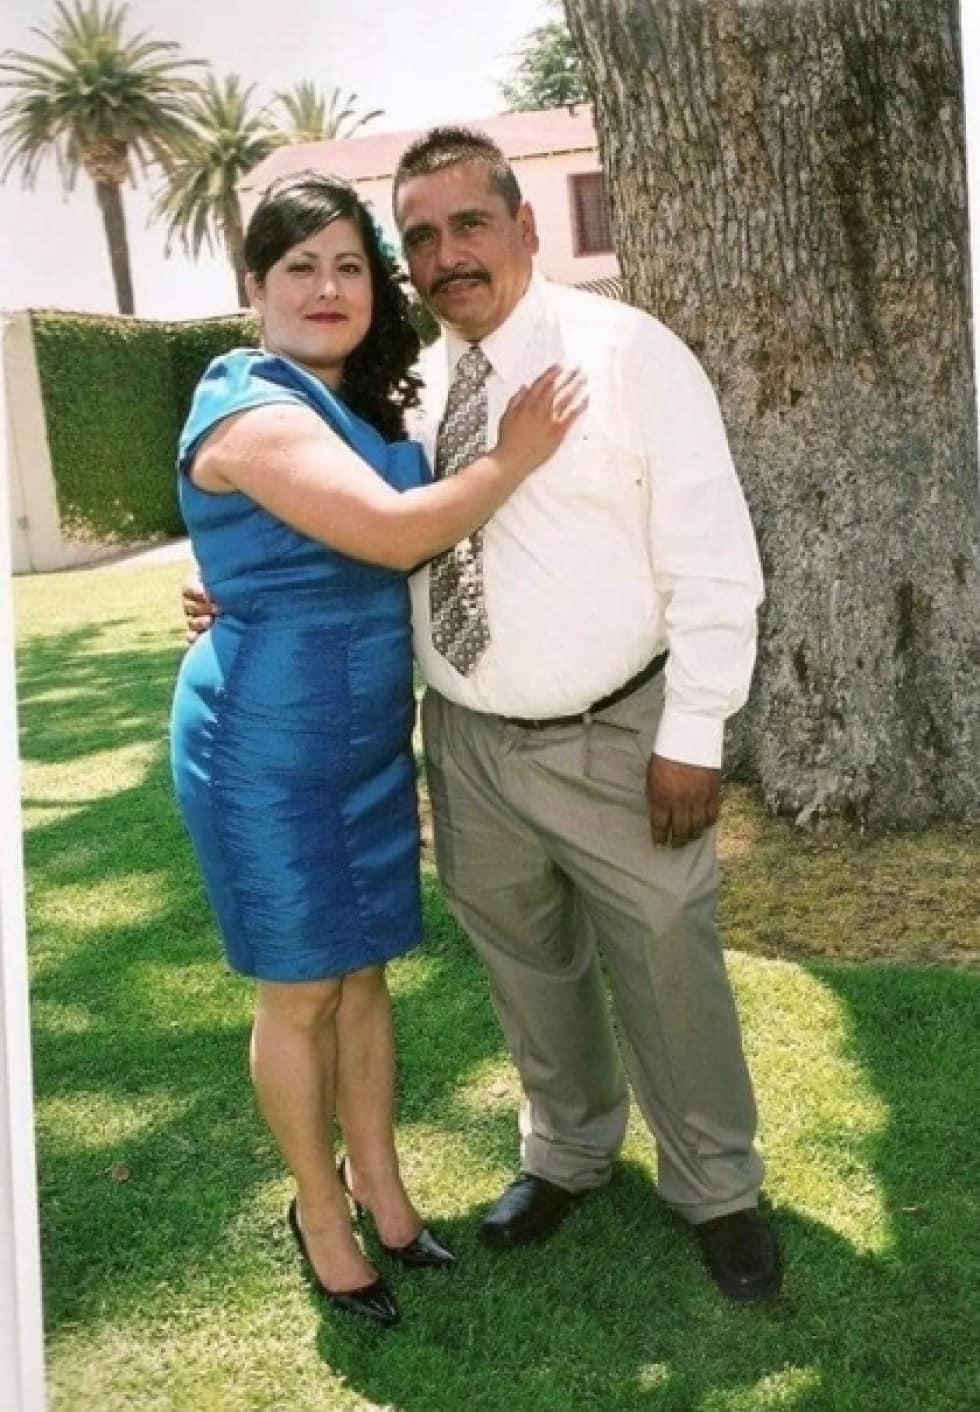 Couple die of COVID-19 hours apart leaving behind 7 children